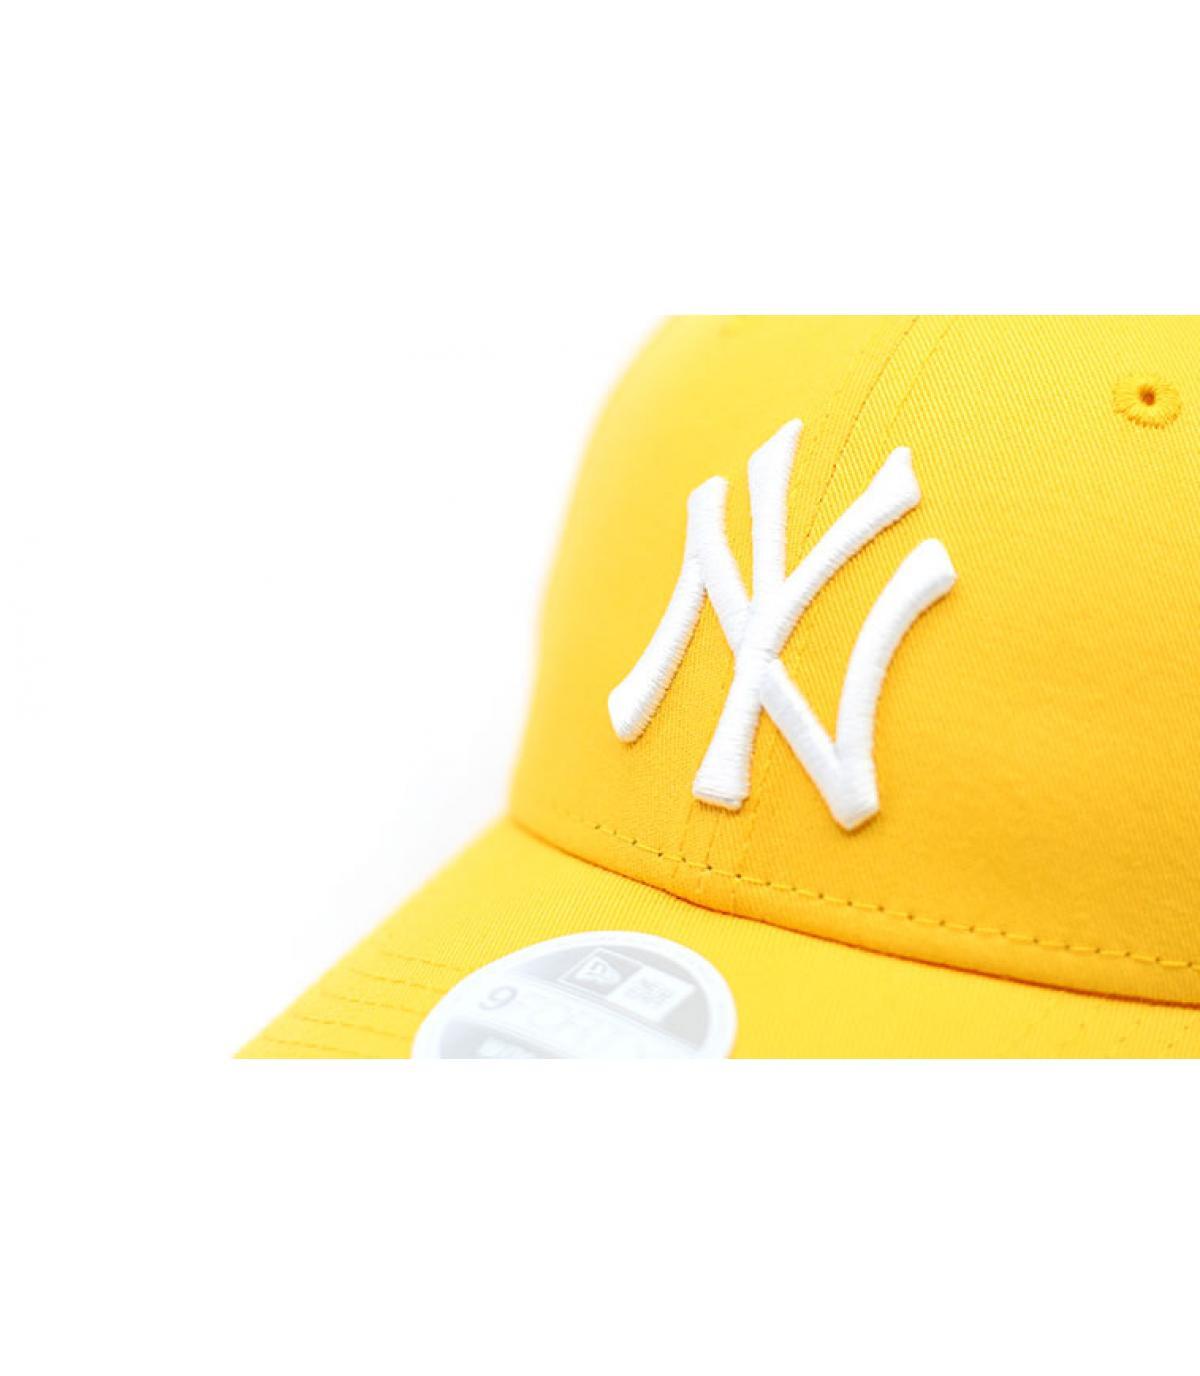 Dettagli Wmns League Ess NY 9Forty gold - image 3